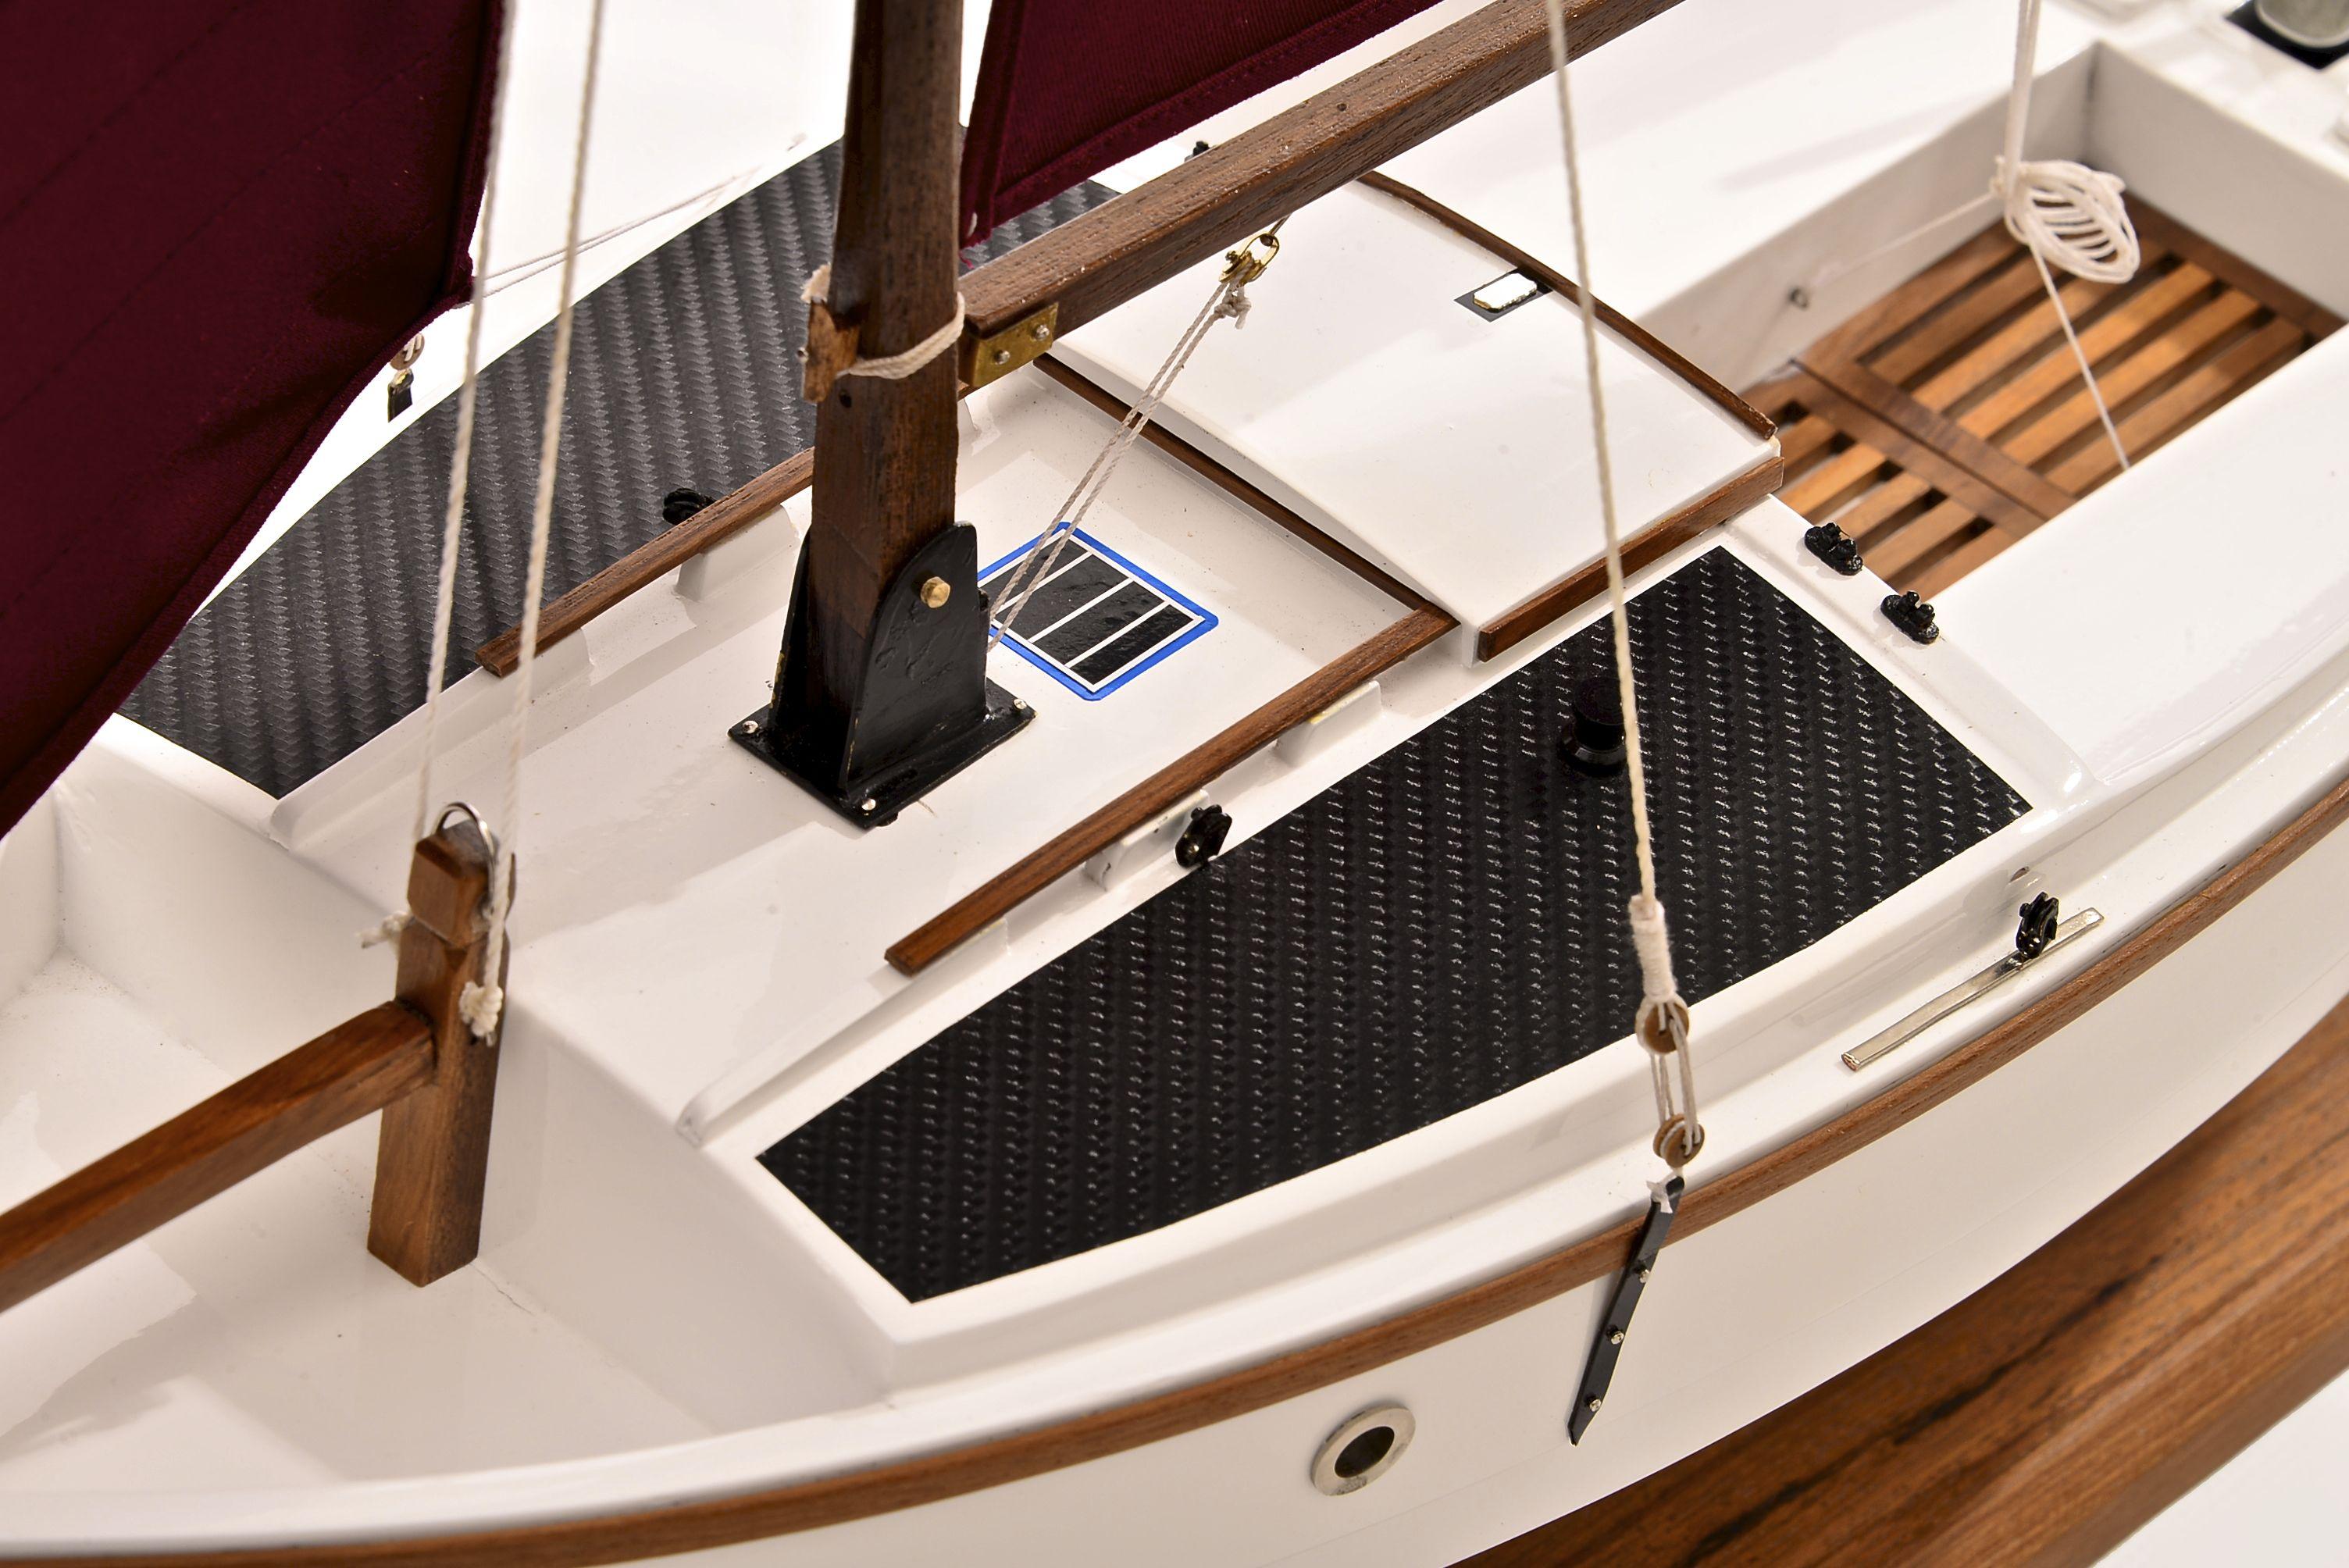 Shrimping Model Boat